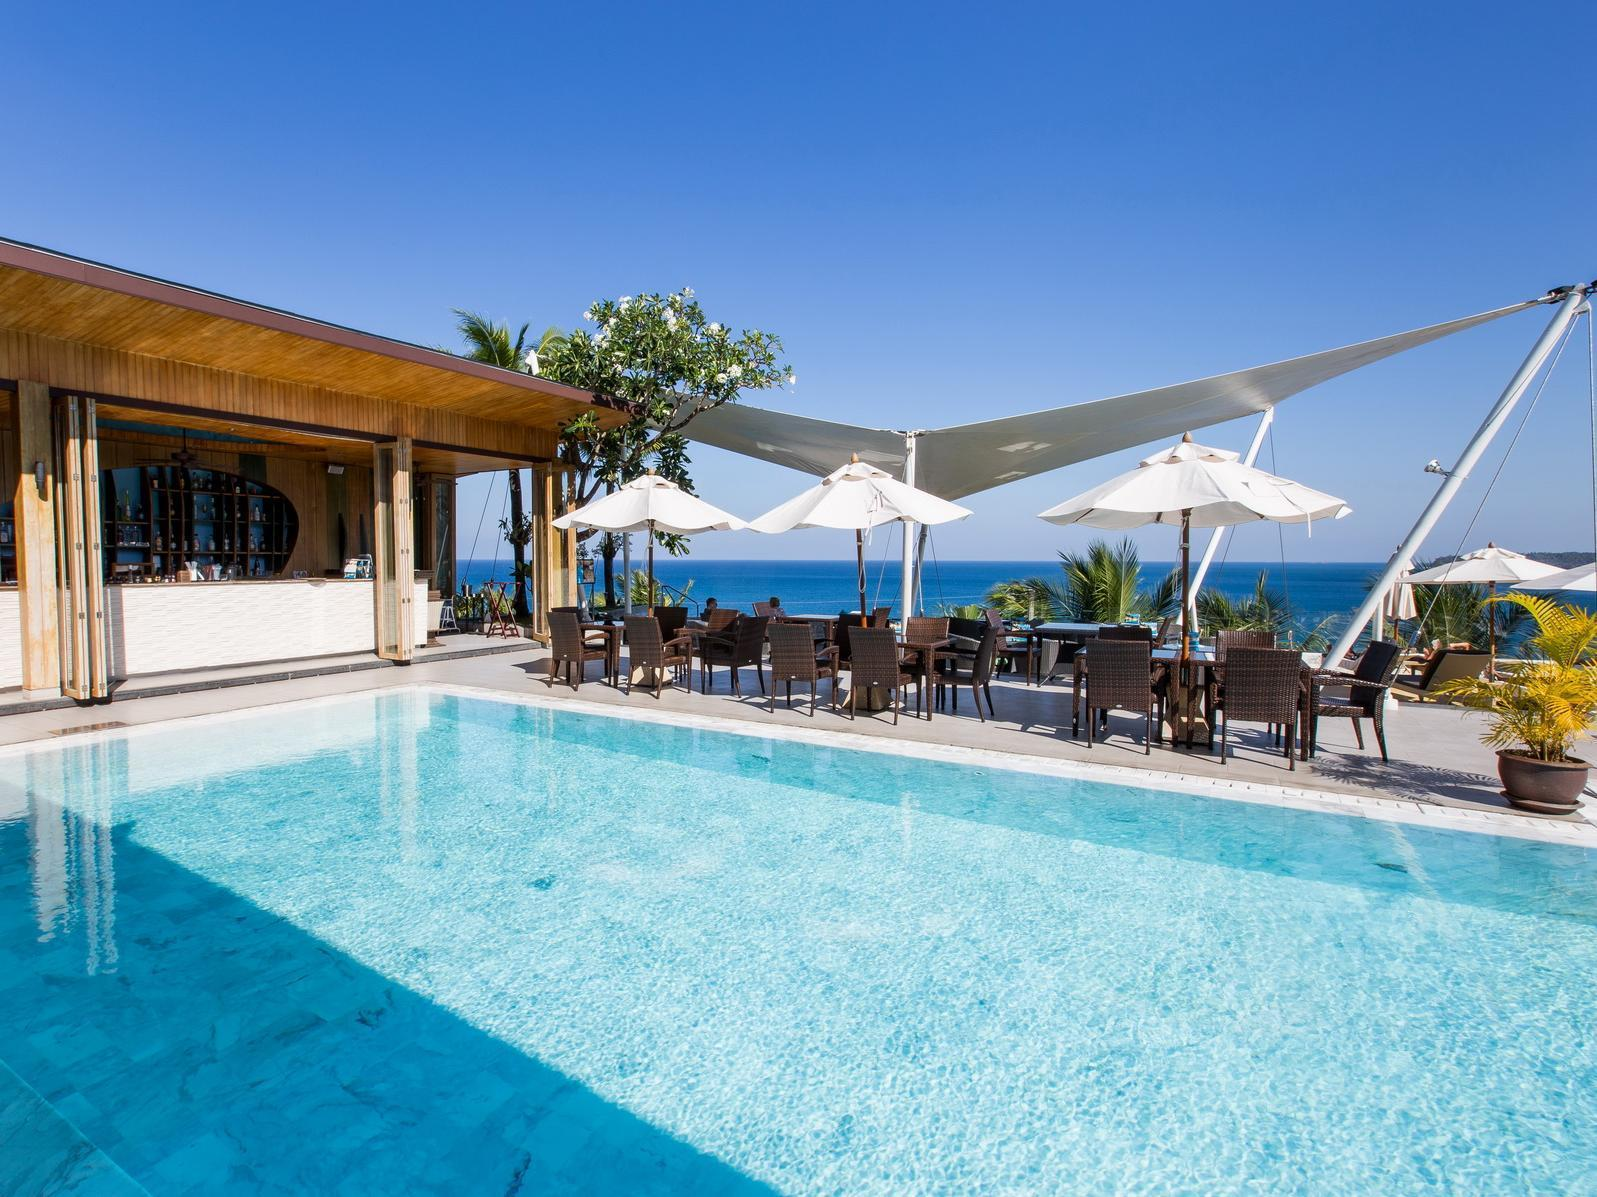 Cape Sienna Phuket Hotel and Villas9